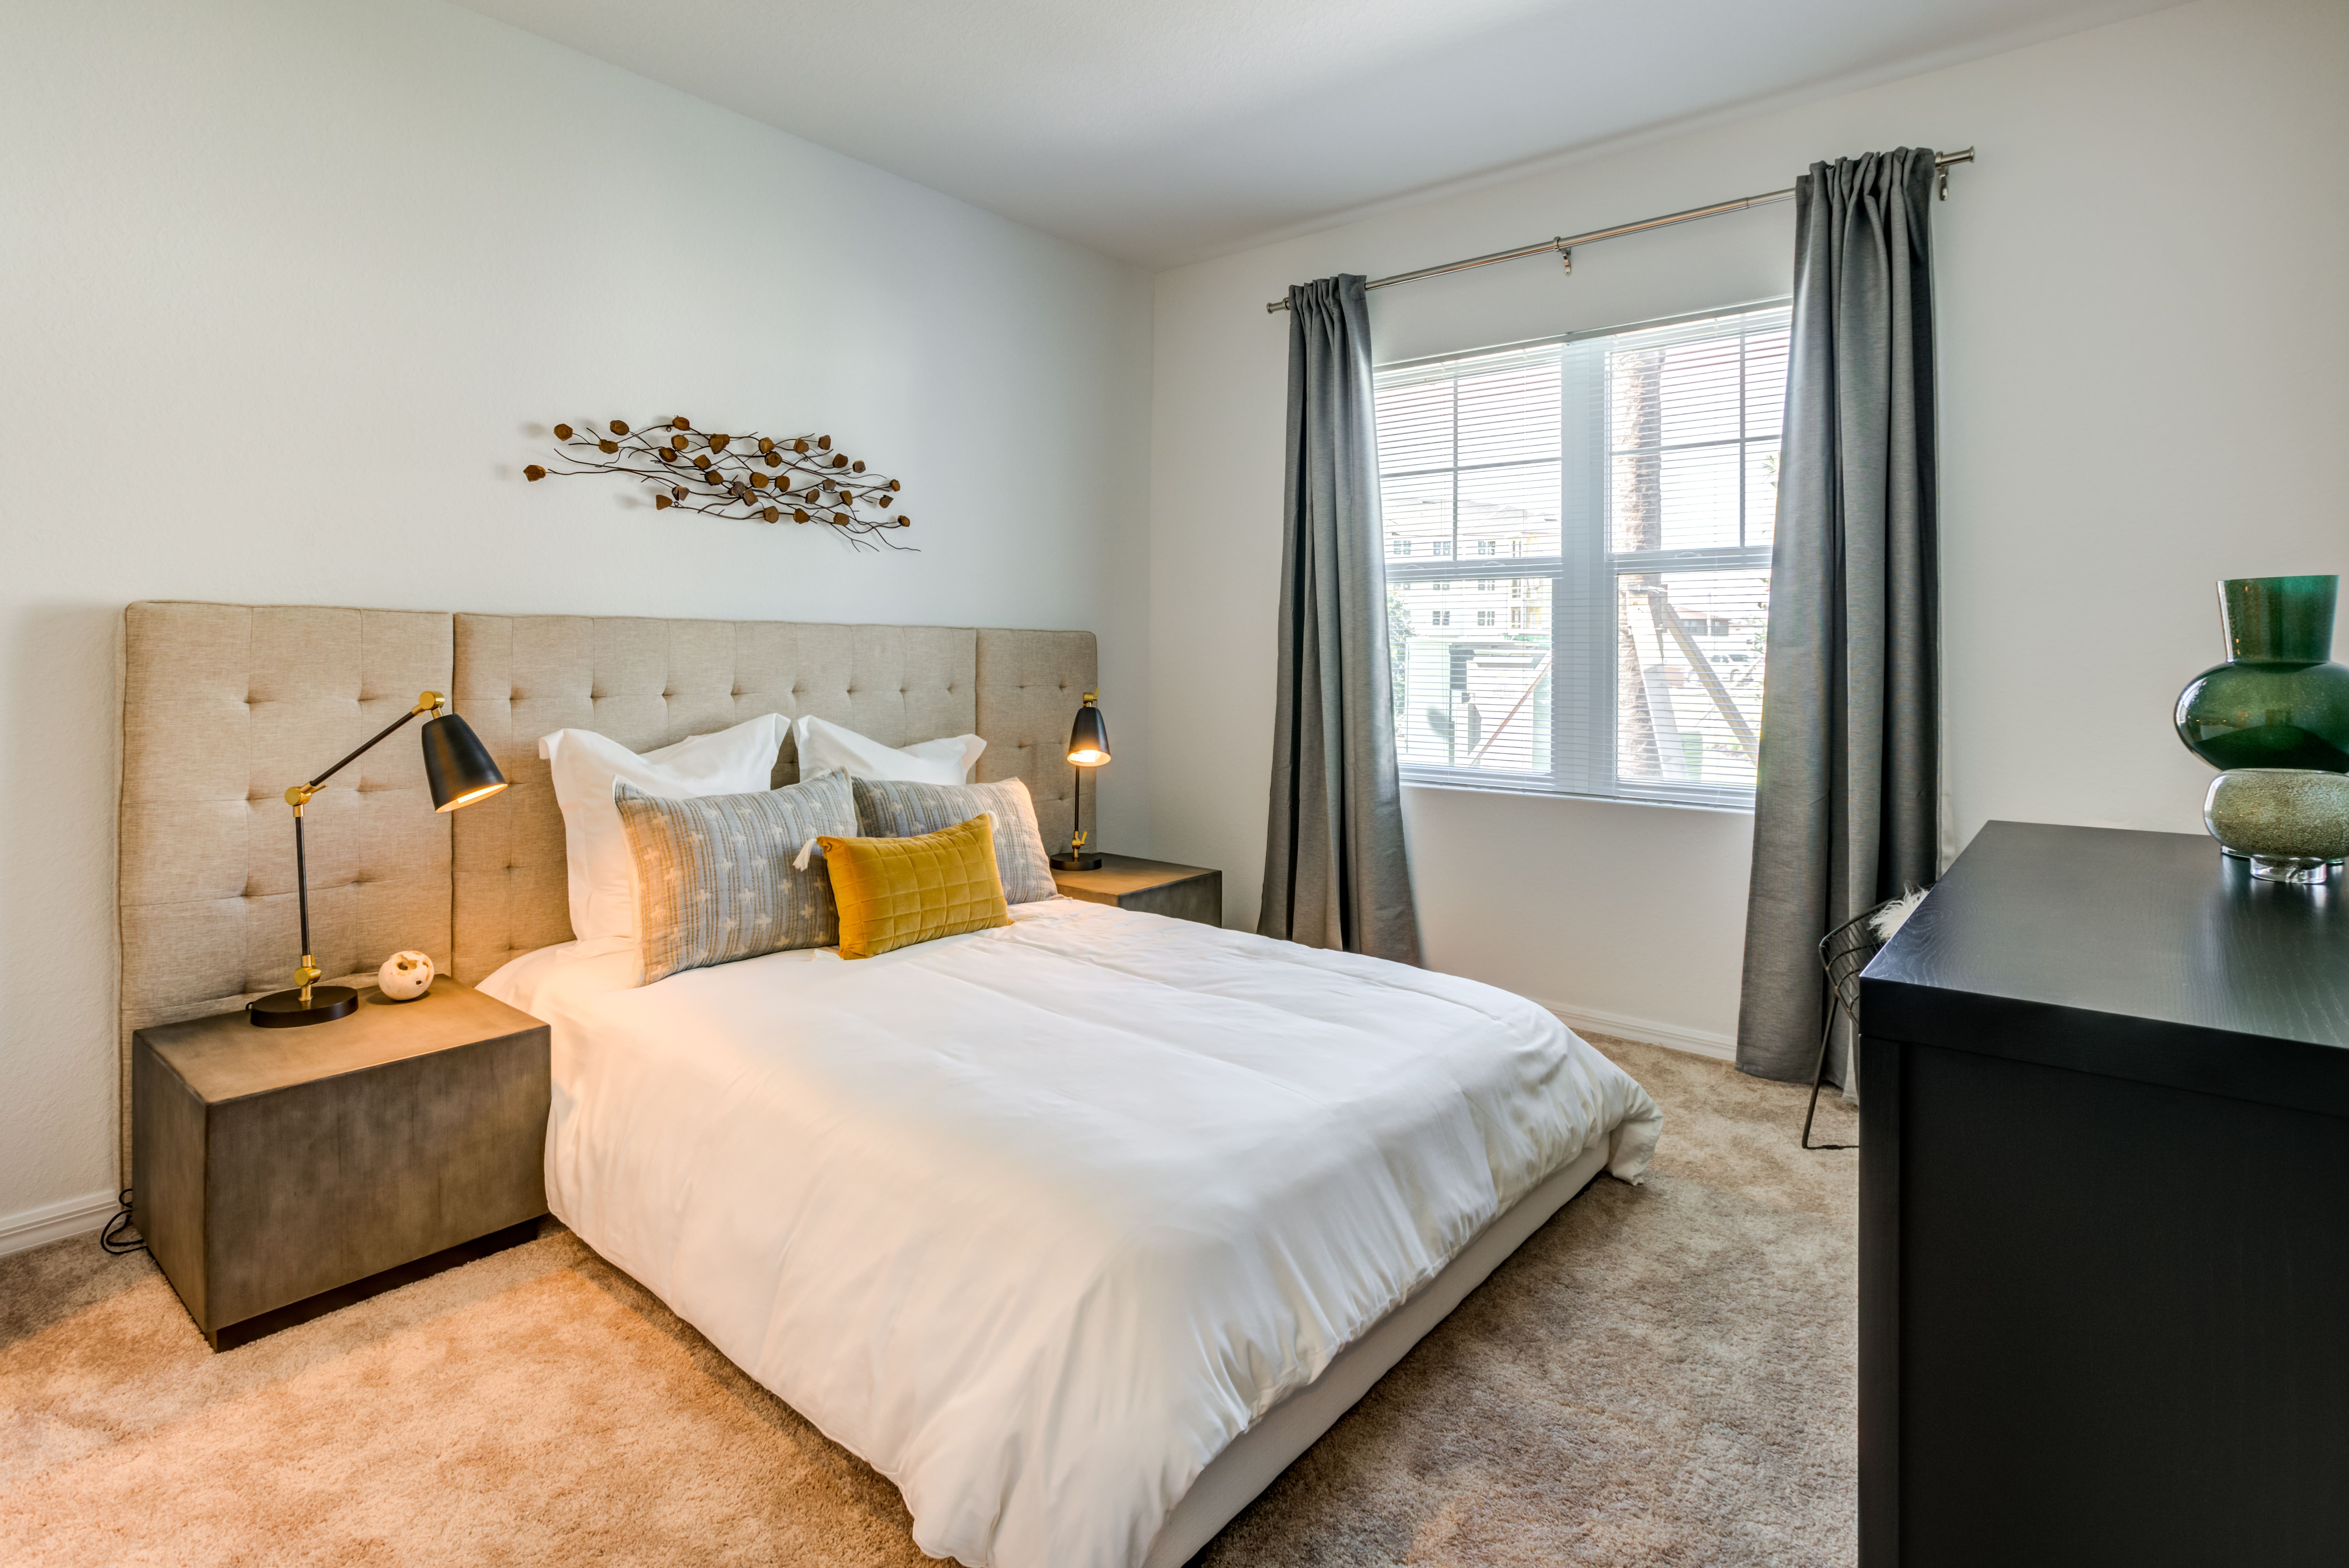 spacious, carpeted bedroom